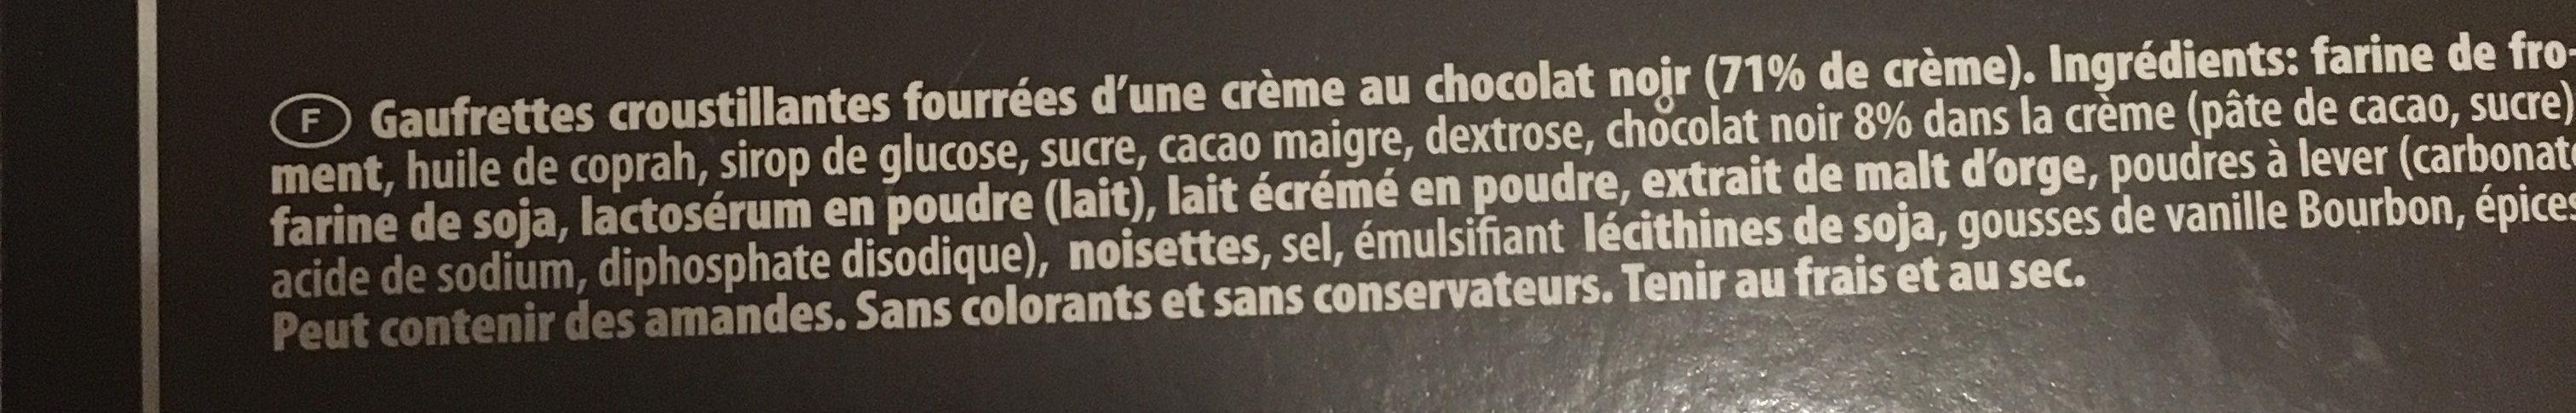 Gaufrettes Chocolat - Ingrédients - fr